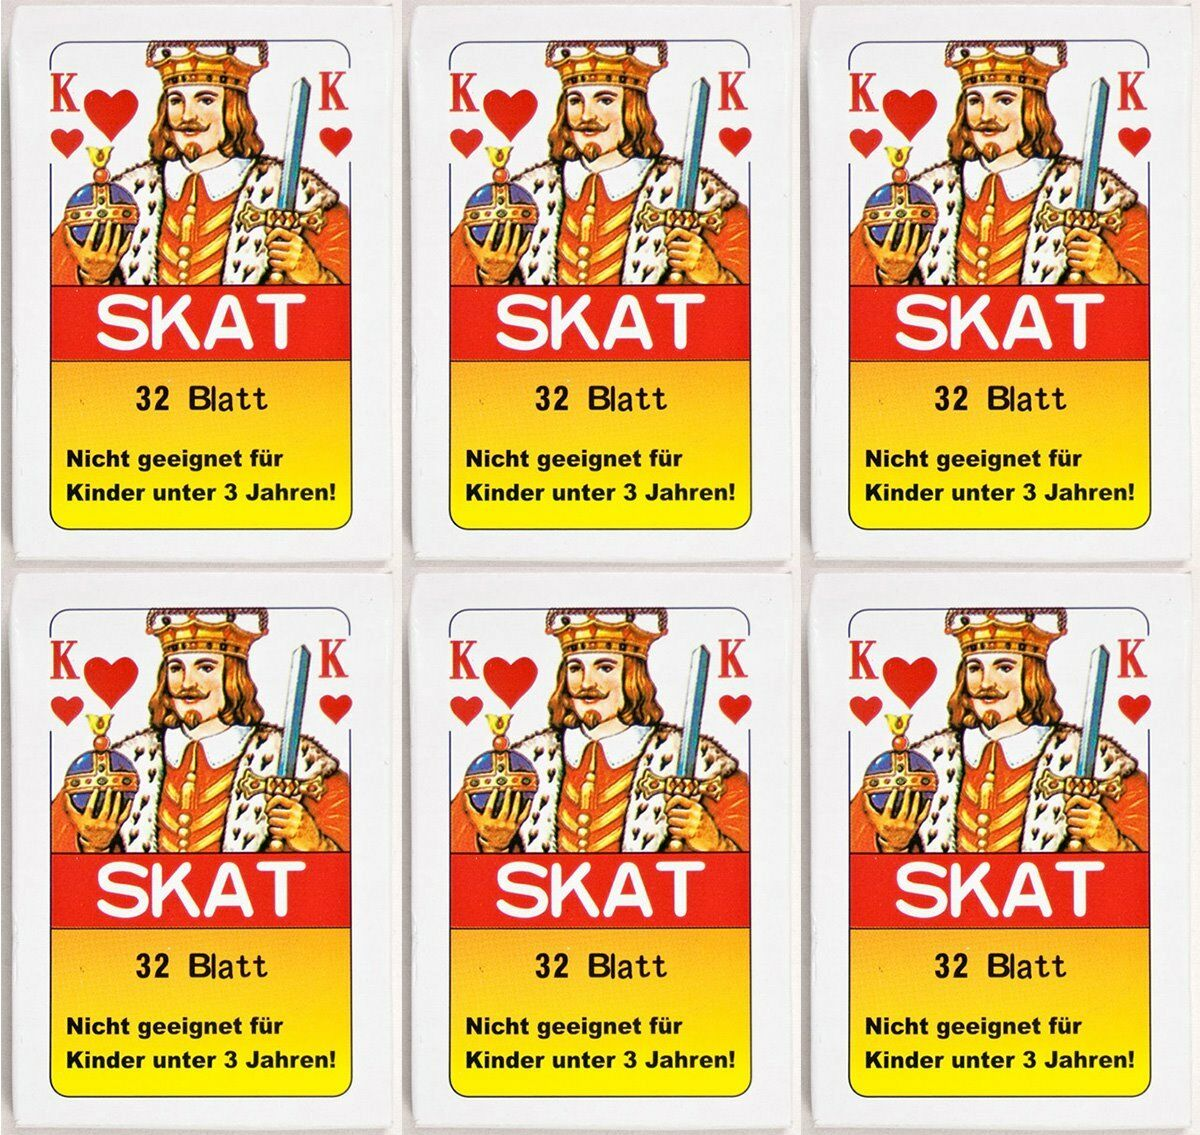 144 x Skatkarten Skatkarte Spielkarte 32 Blatt Blatt Blatt Skat Karten Französische Blatt a420d5